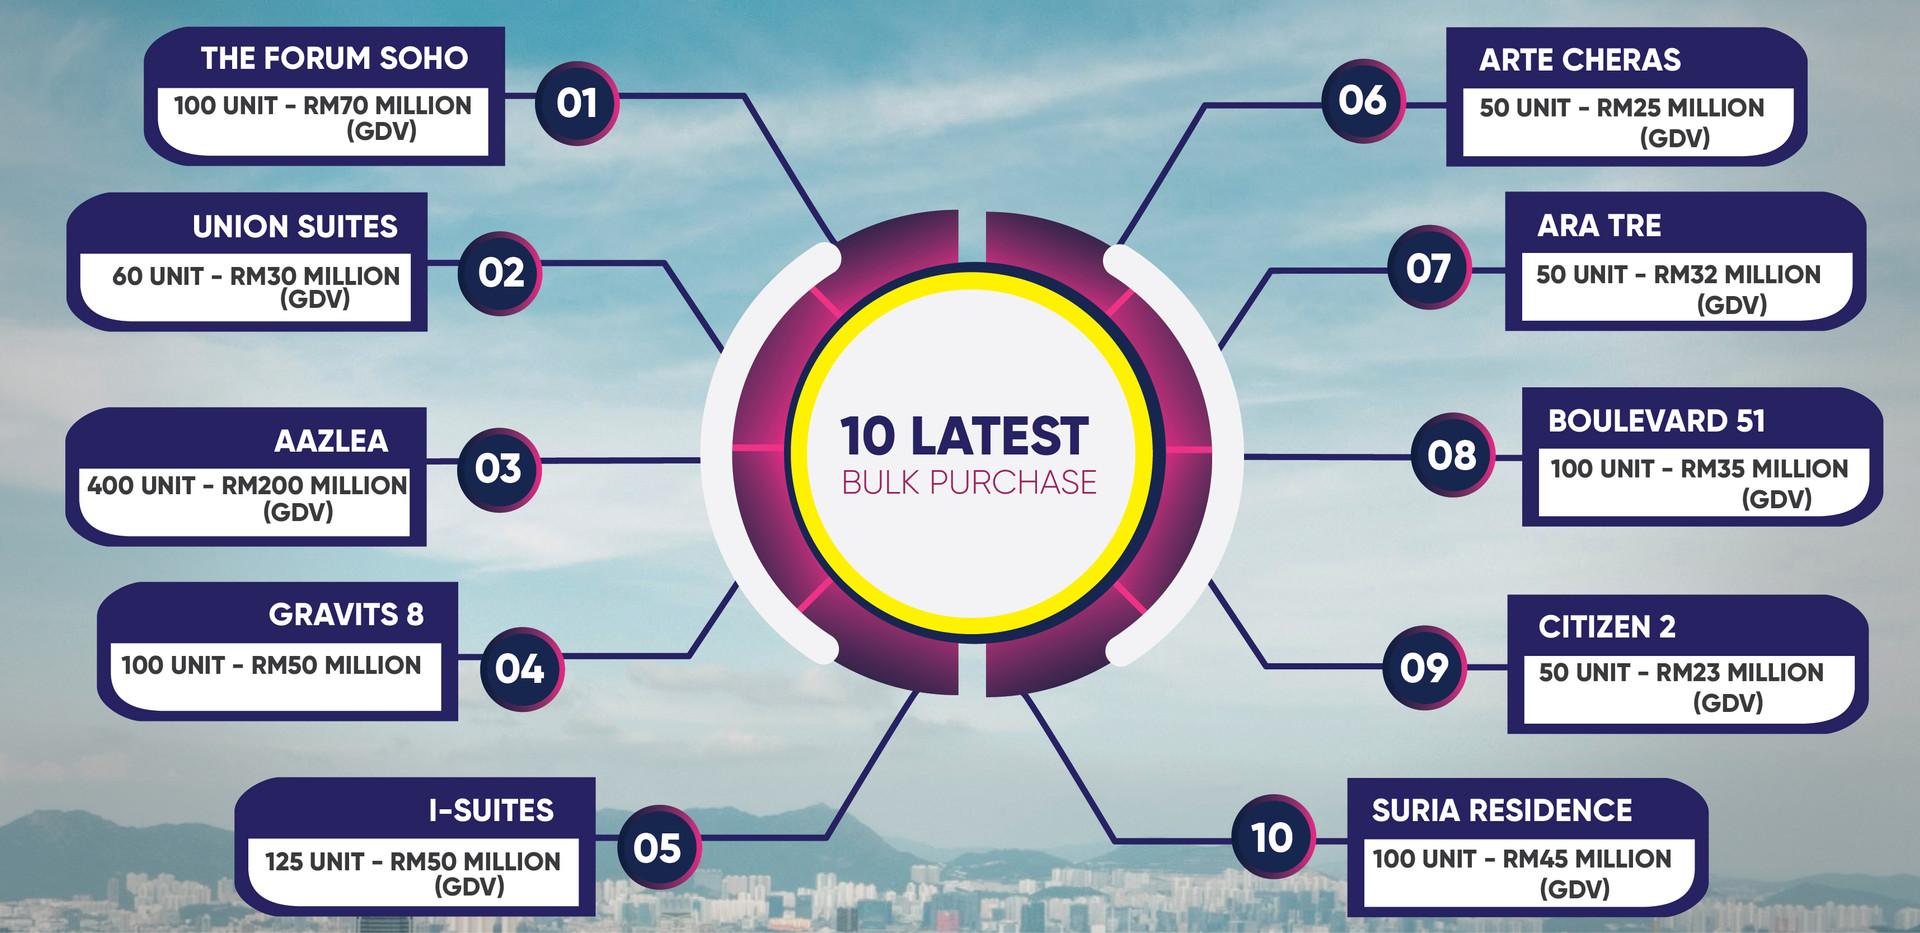 Latest Top 10 Bulk Purchased